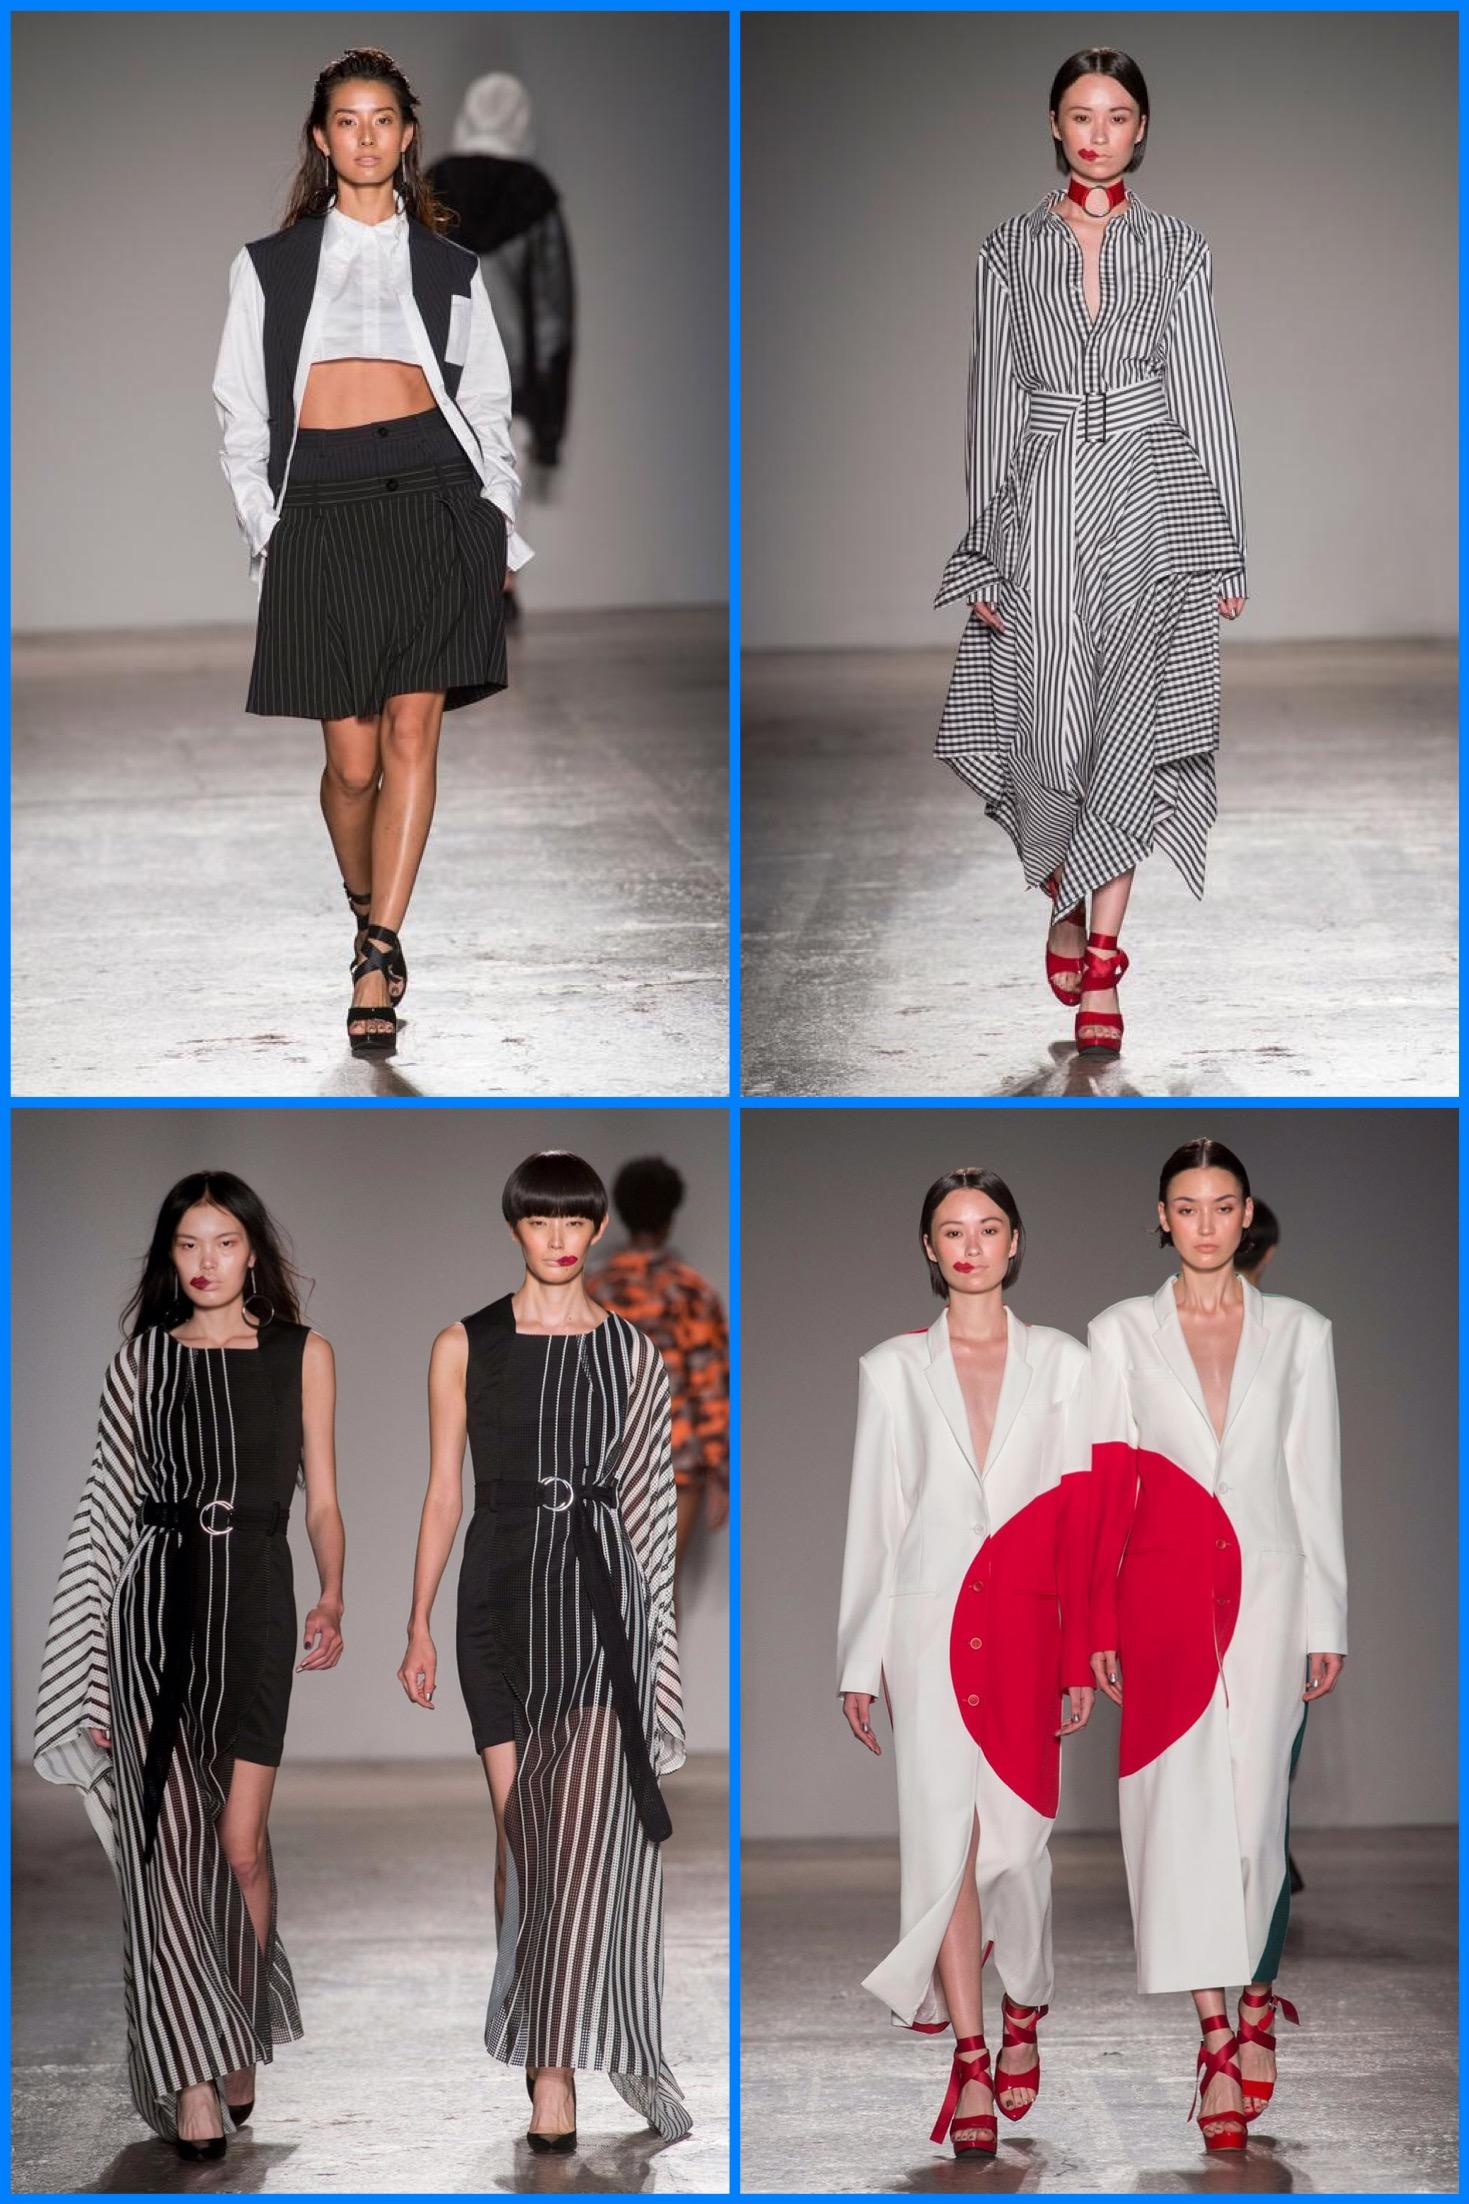 milano-fashion-week-pret-a-porter-spring-summer-2017-style-atsushi-nakashima